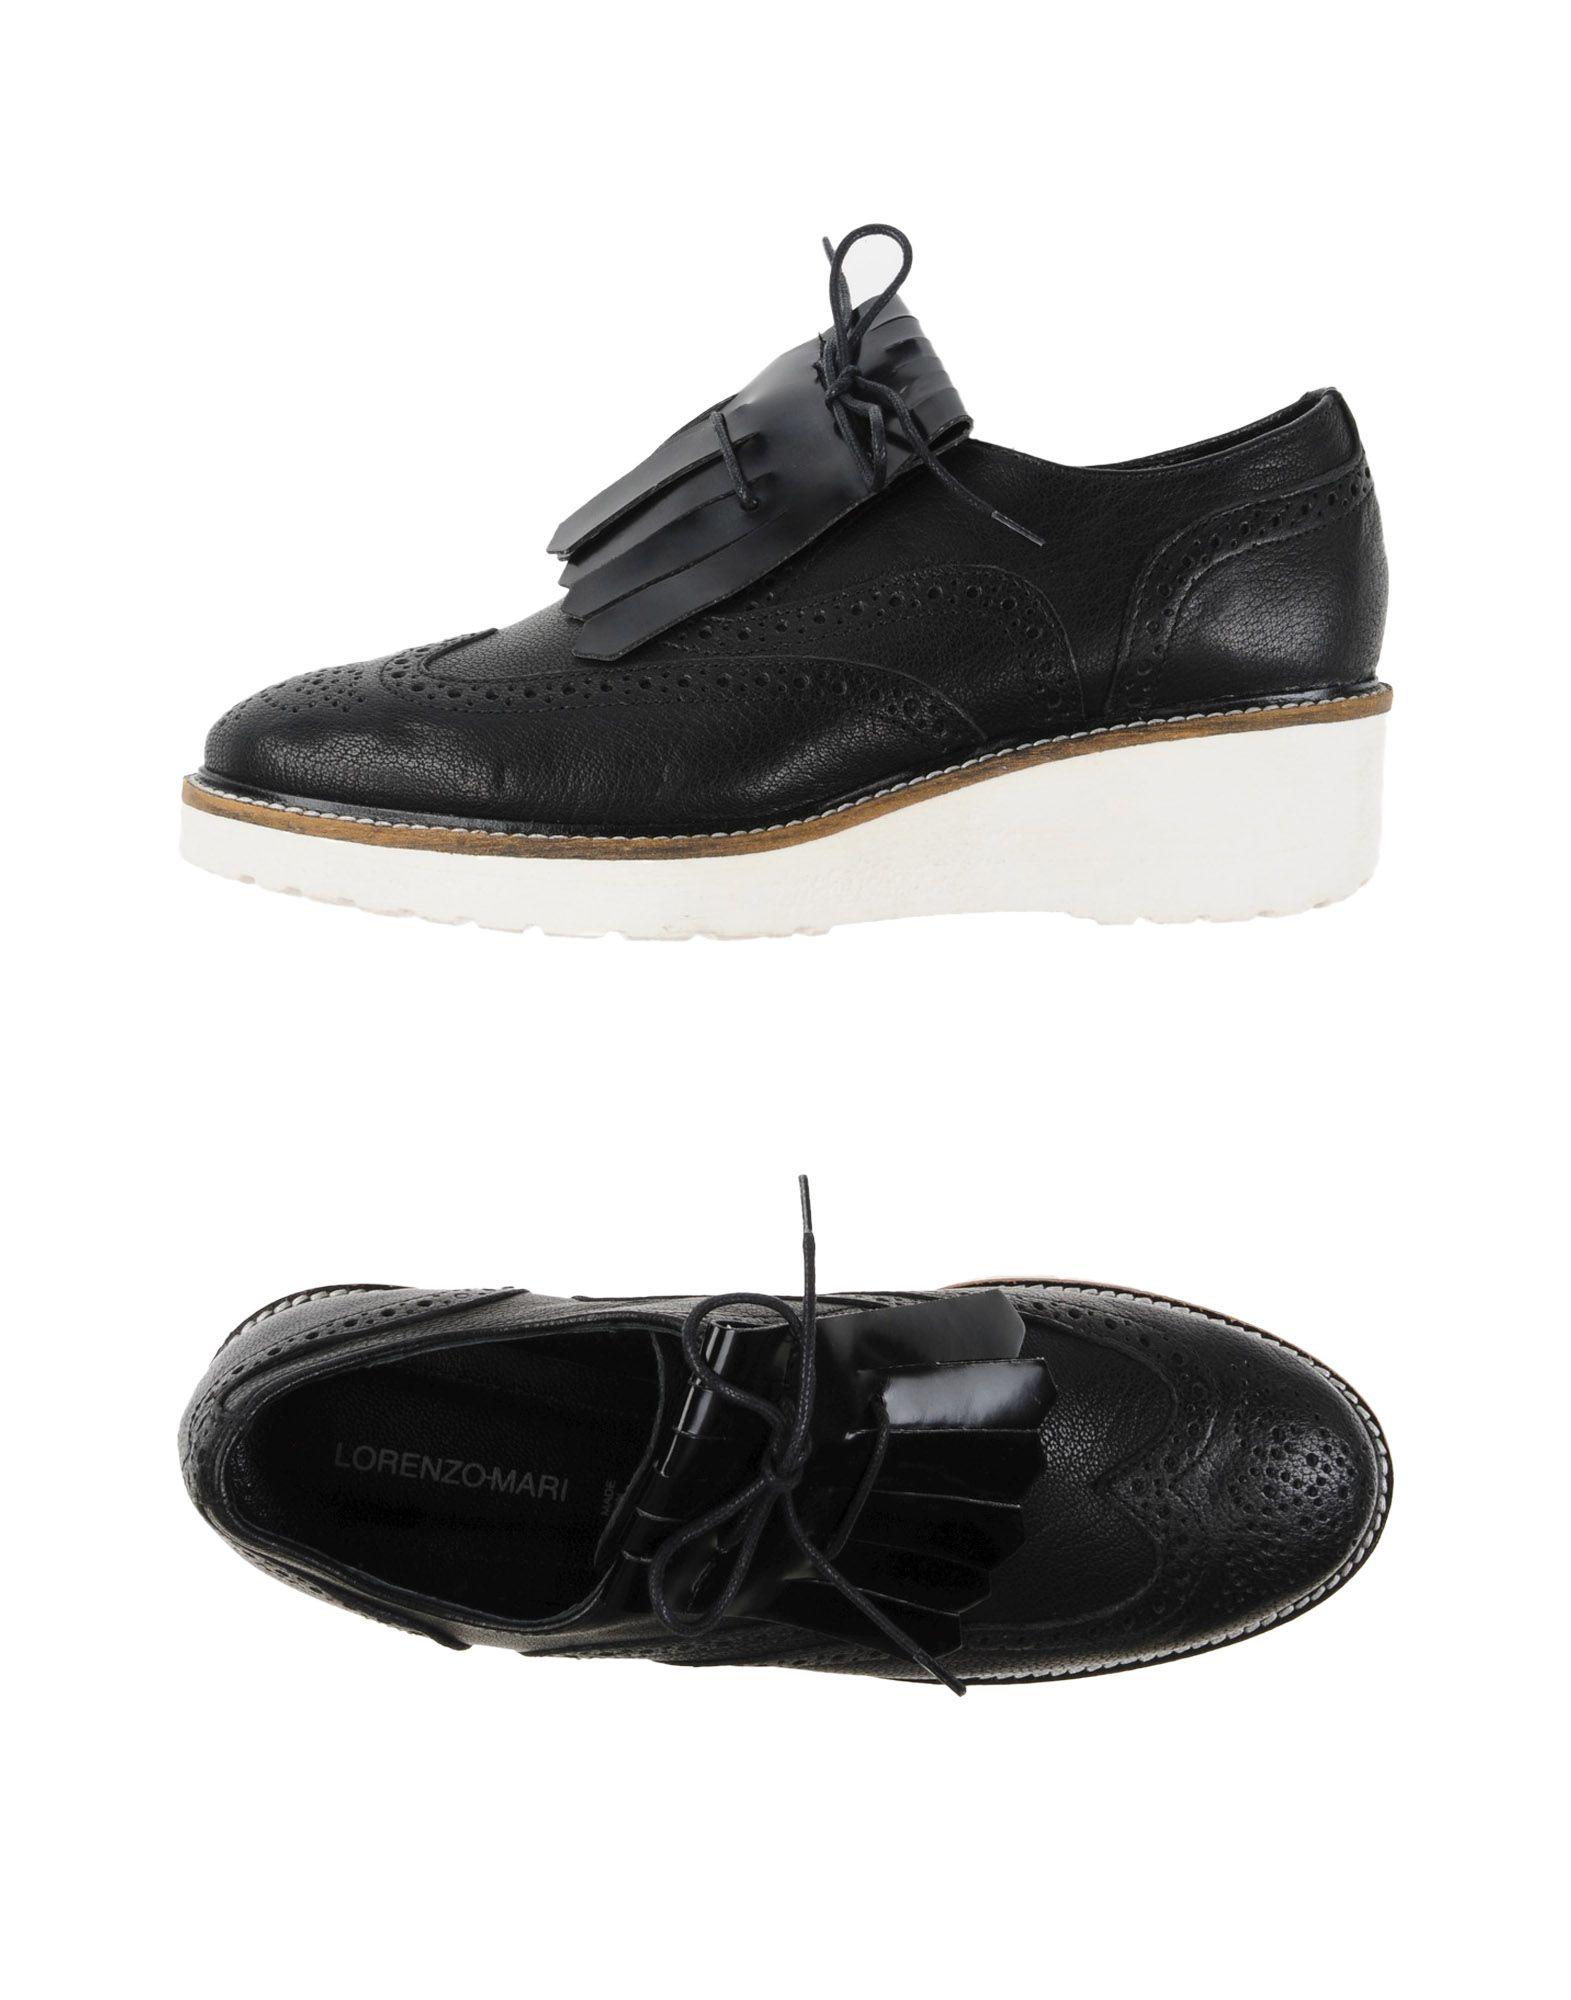 Chaussures À Lacets Lorenzo Mari Femme - Chaussures À Lacets Lorenzo Mari sur